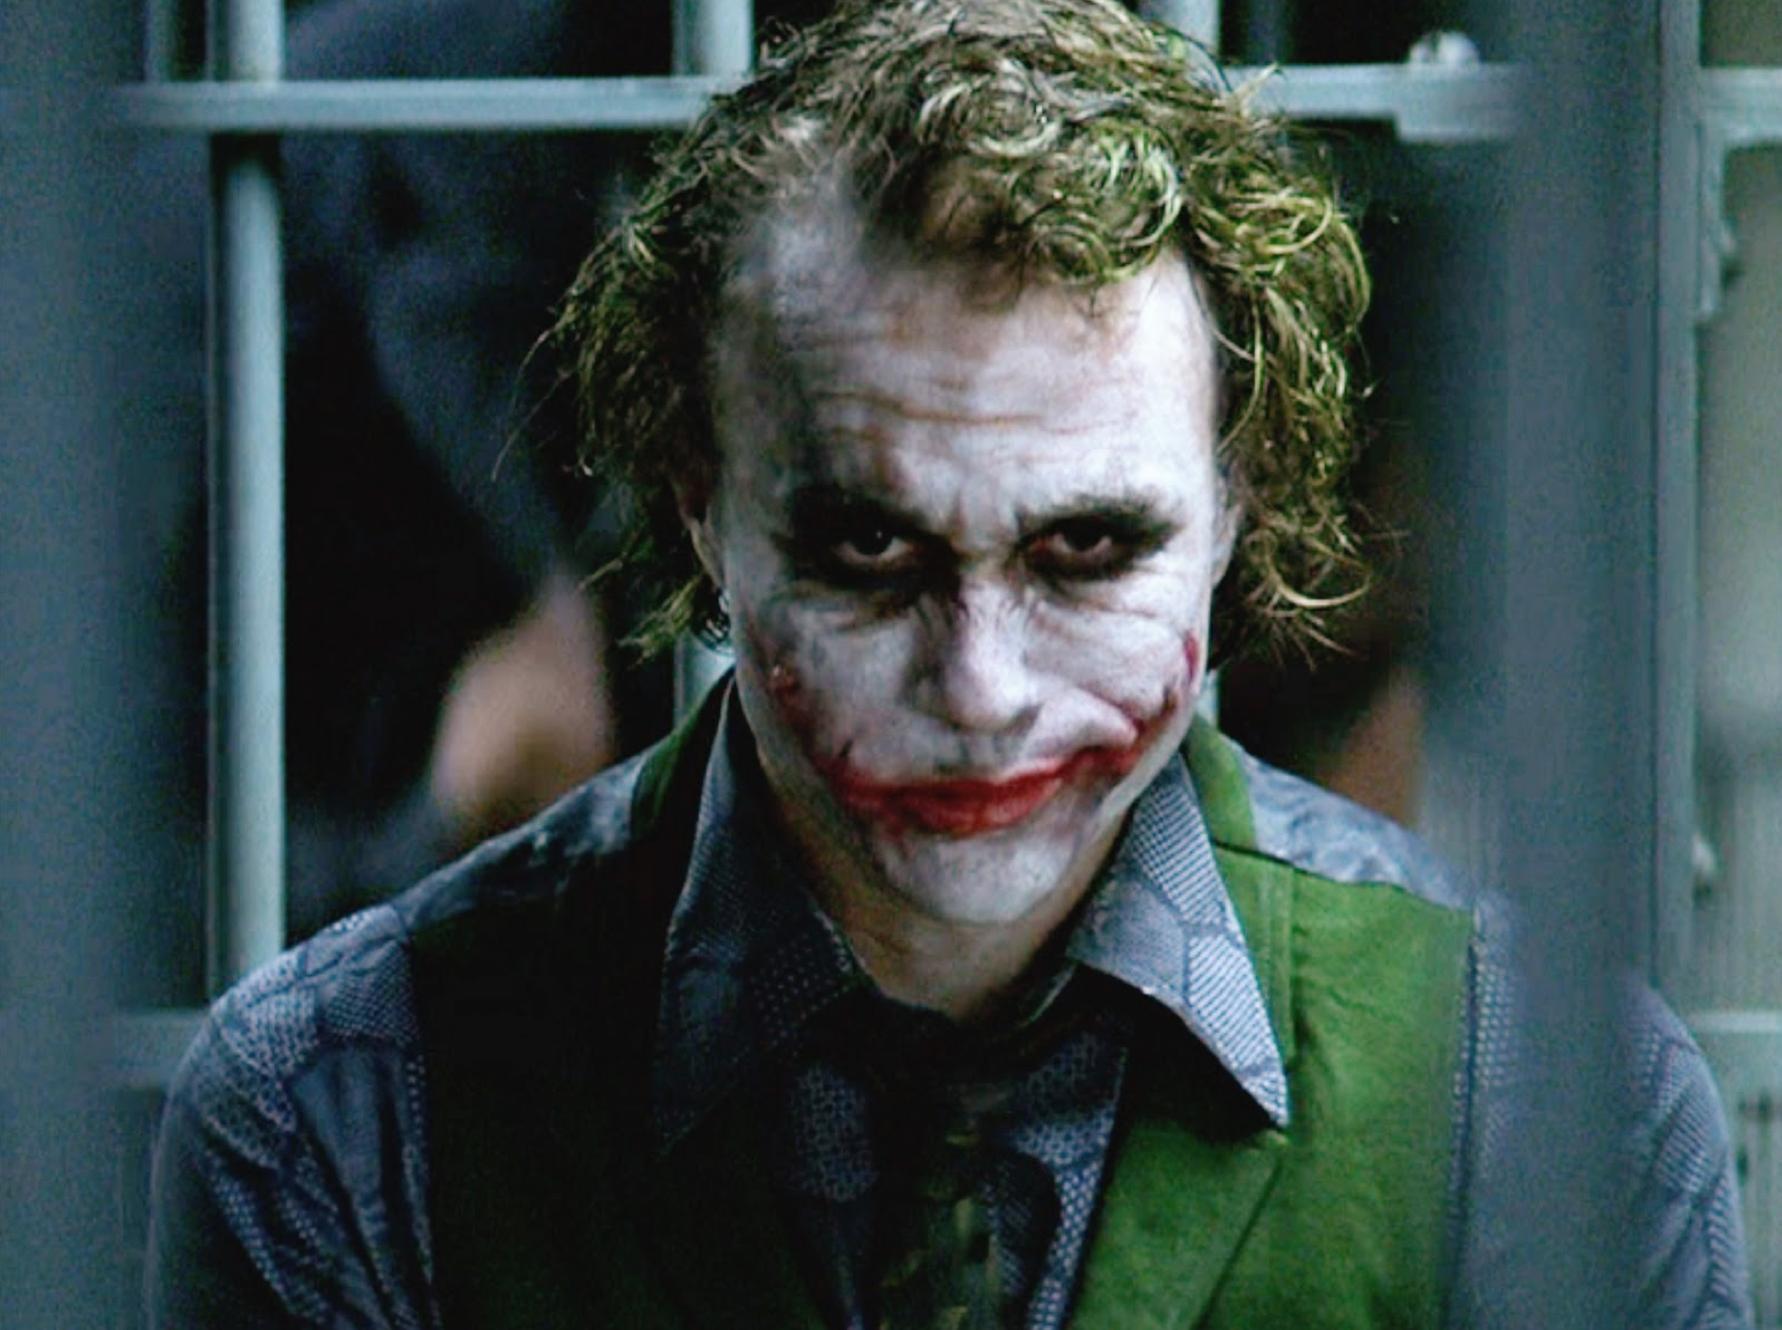 Heath-Ledger-Joker-The-Dark-Knight